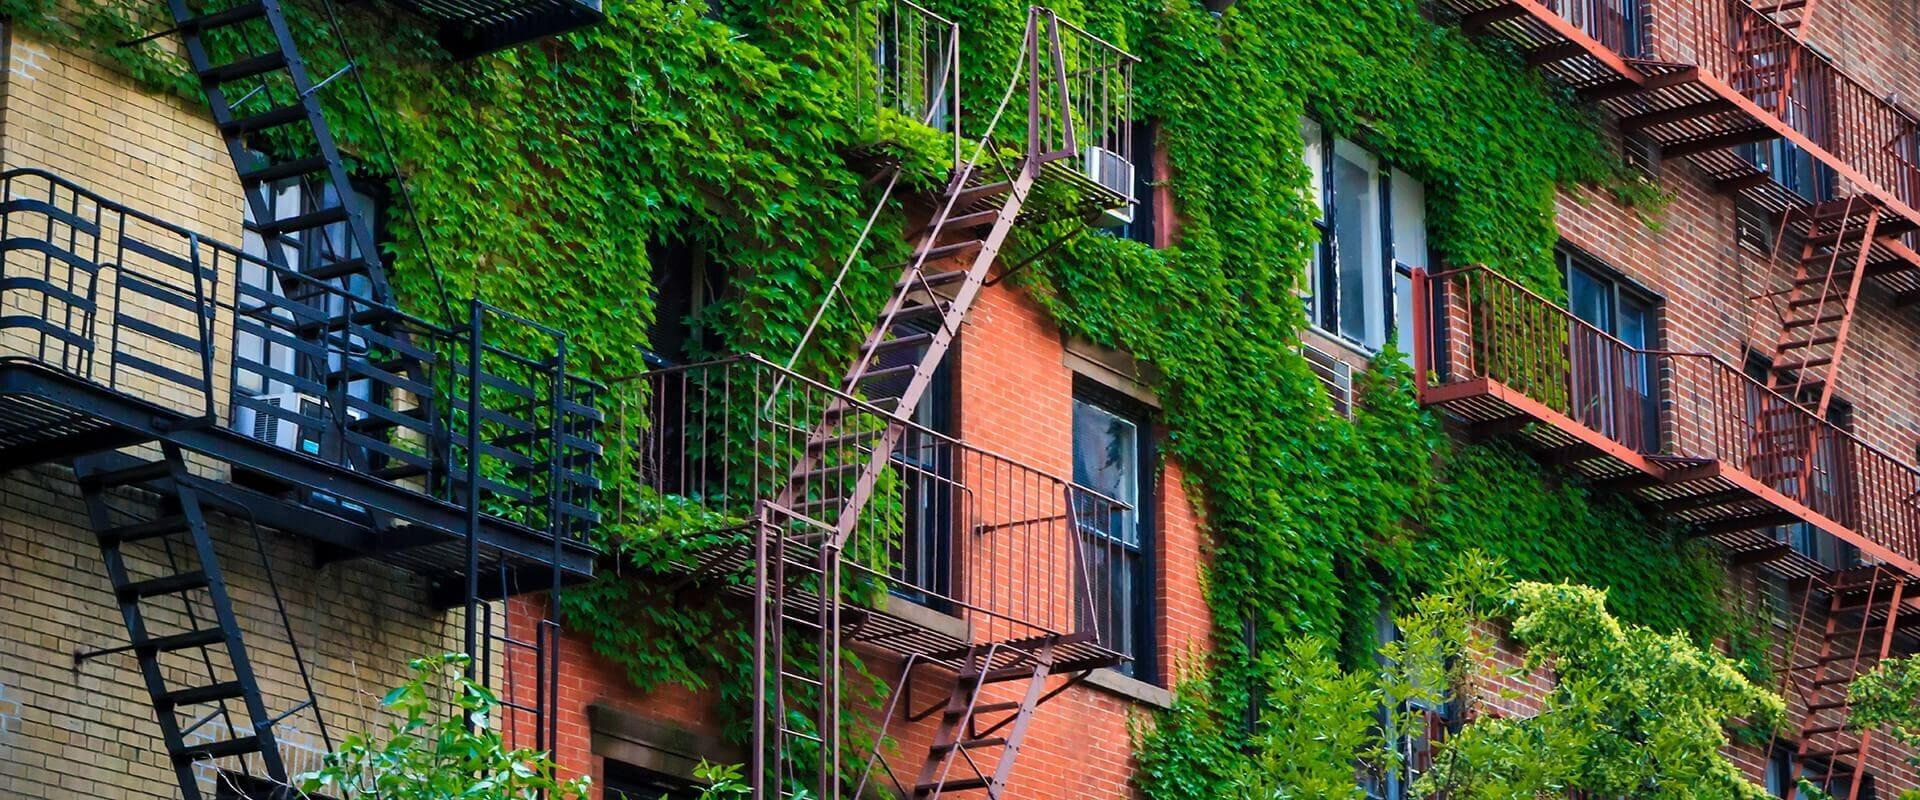 brick apartment buildings